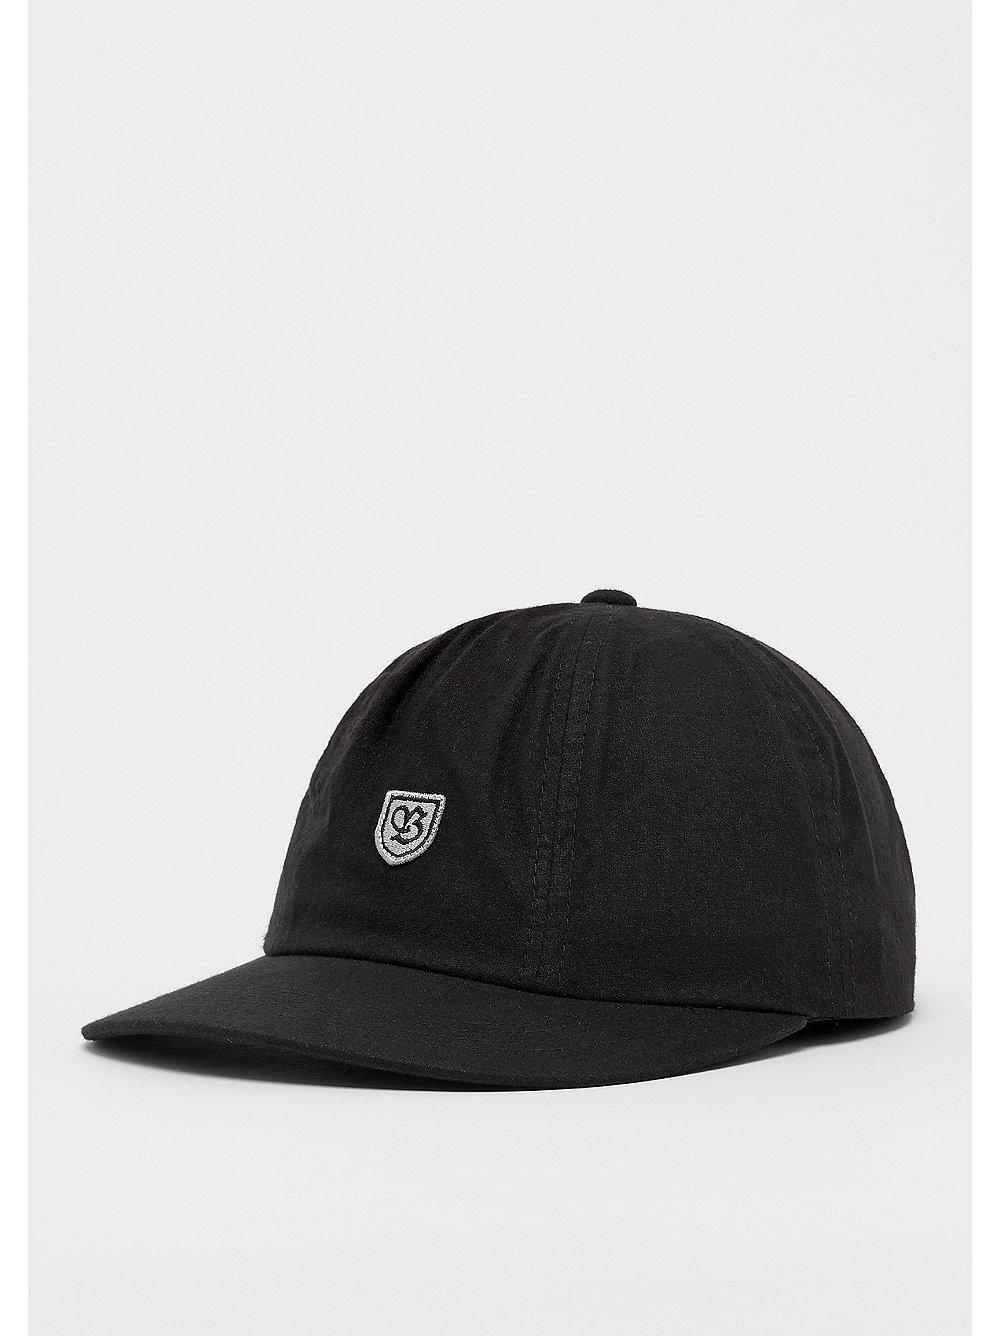 86204a0c359 Brixton B-SHIELD III CAP BLACK GREY bij SNIPES bestellen